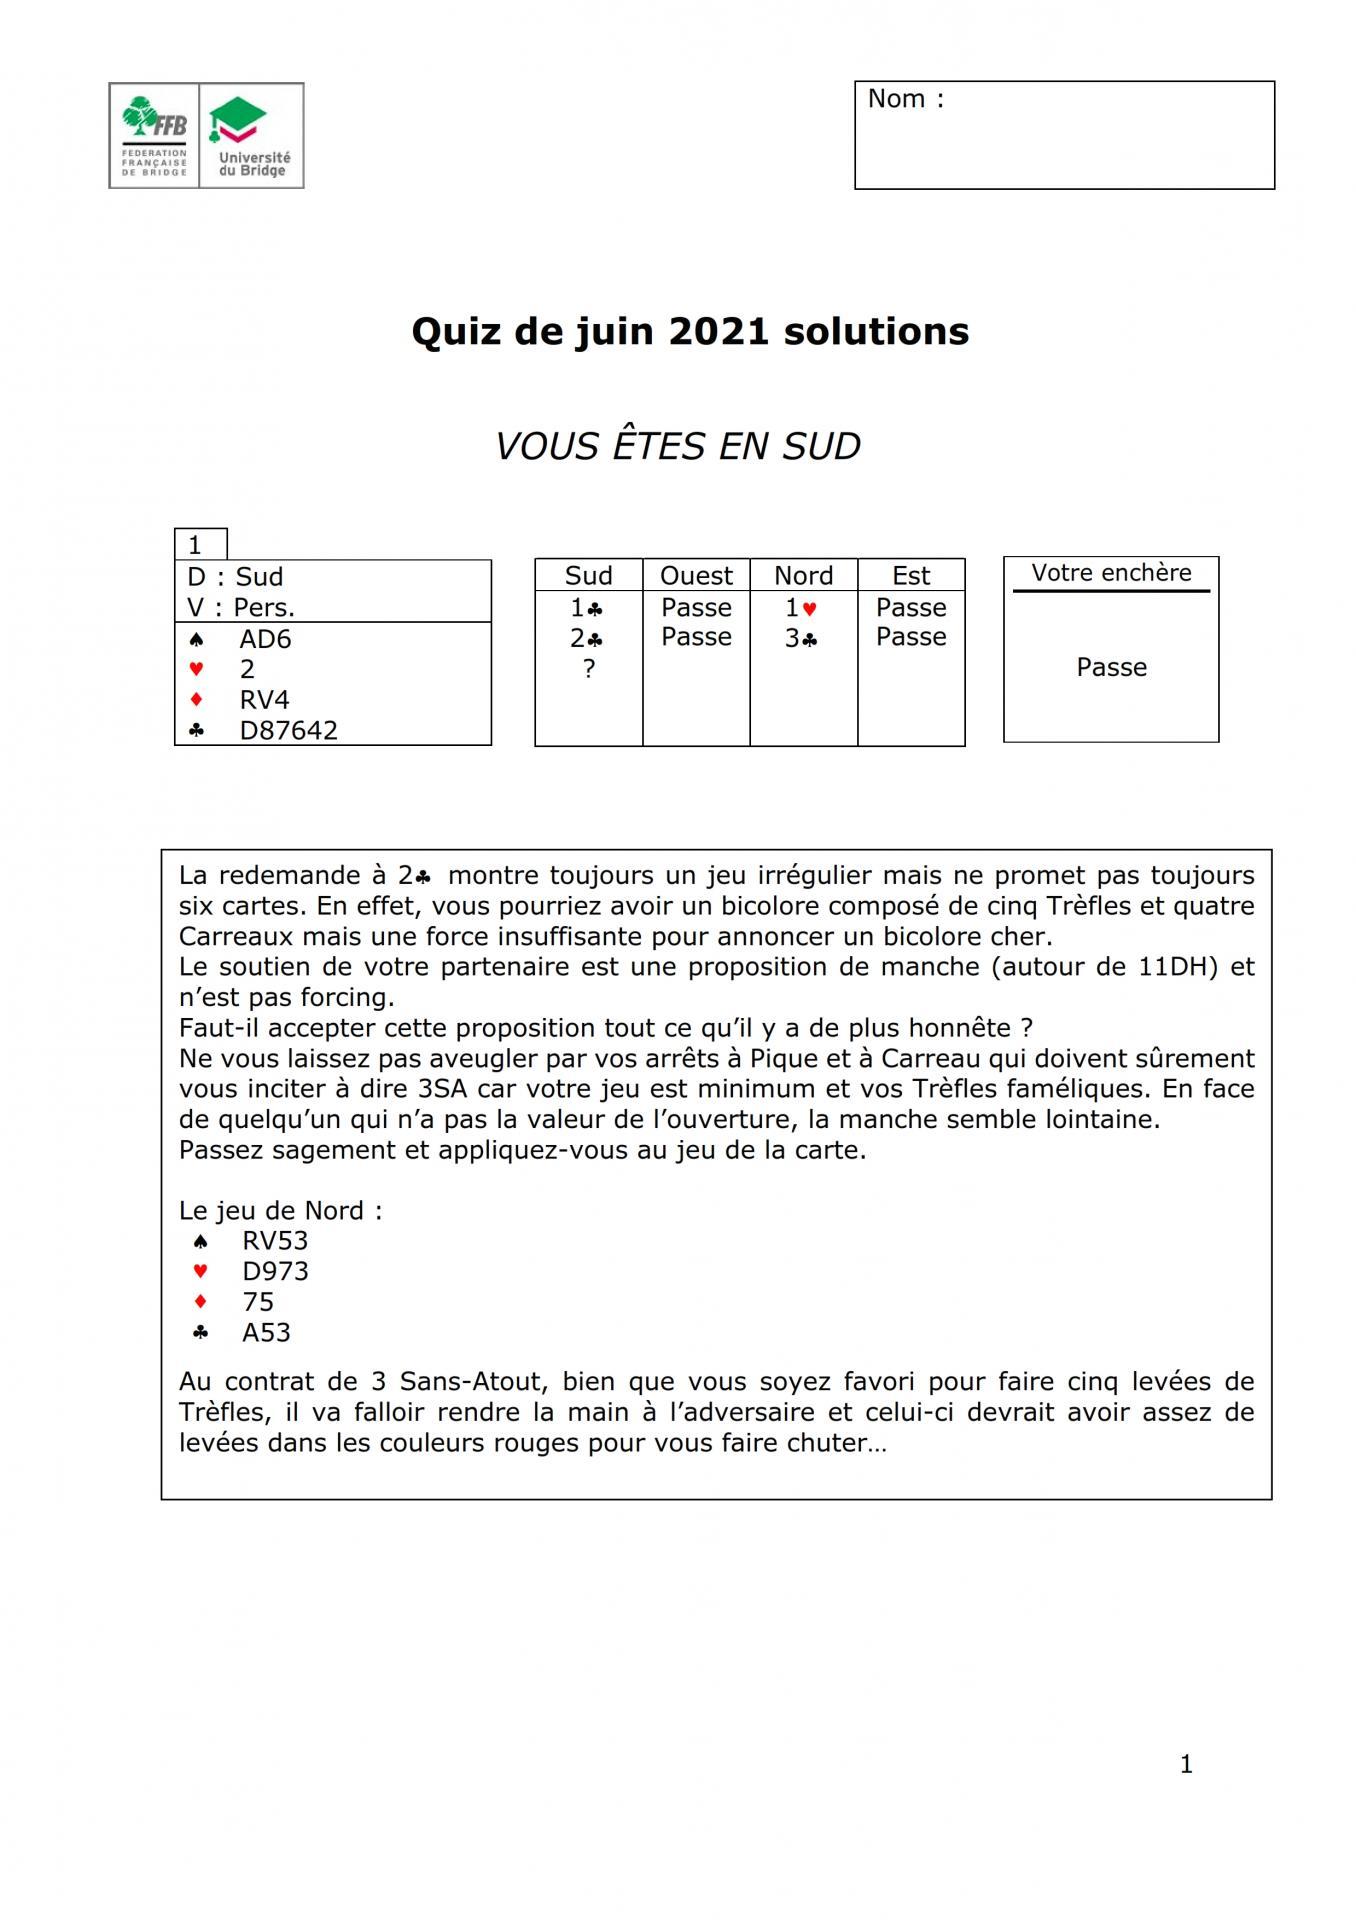 Formation continue des moniteurs solutions avril 2021 001